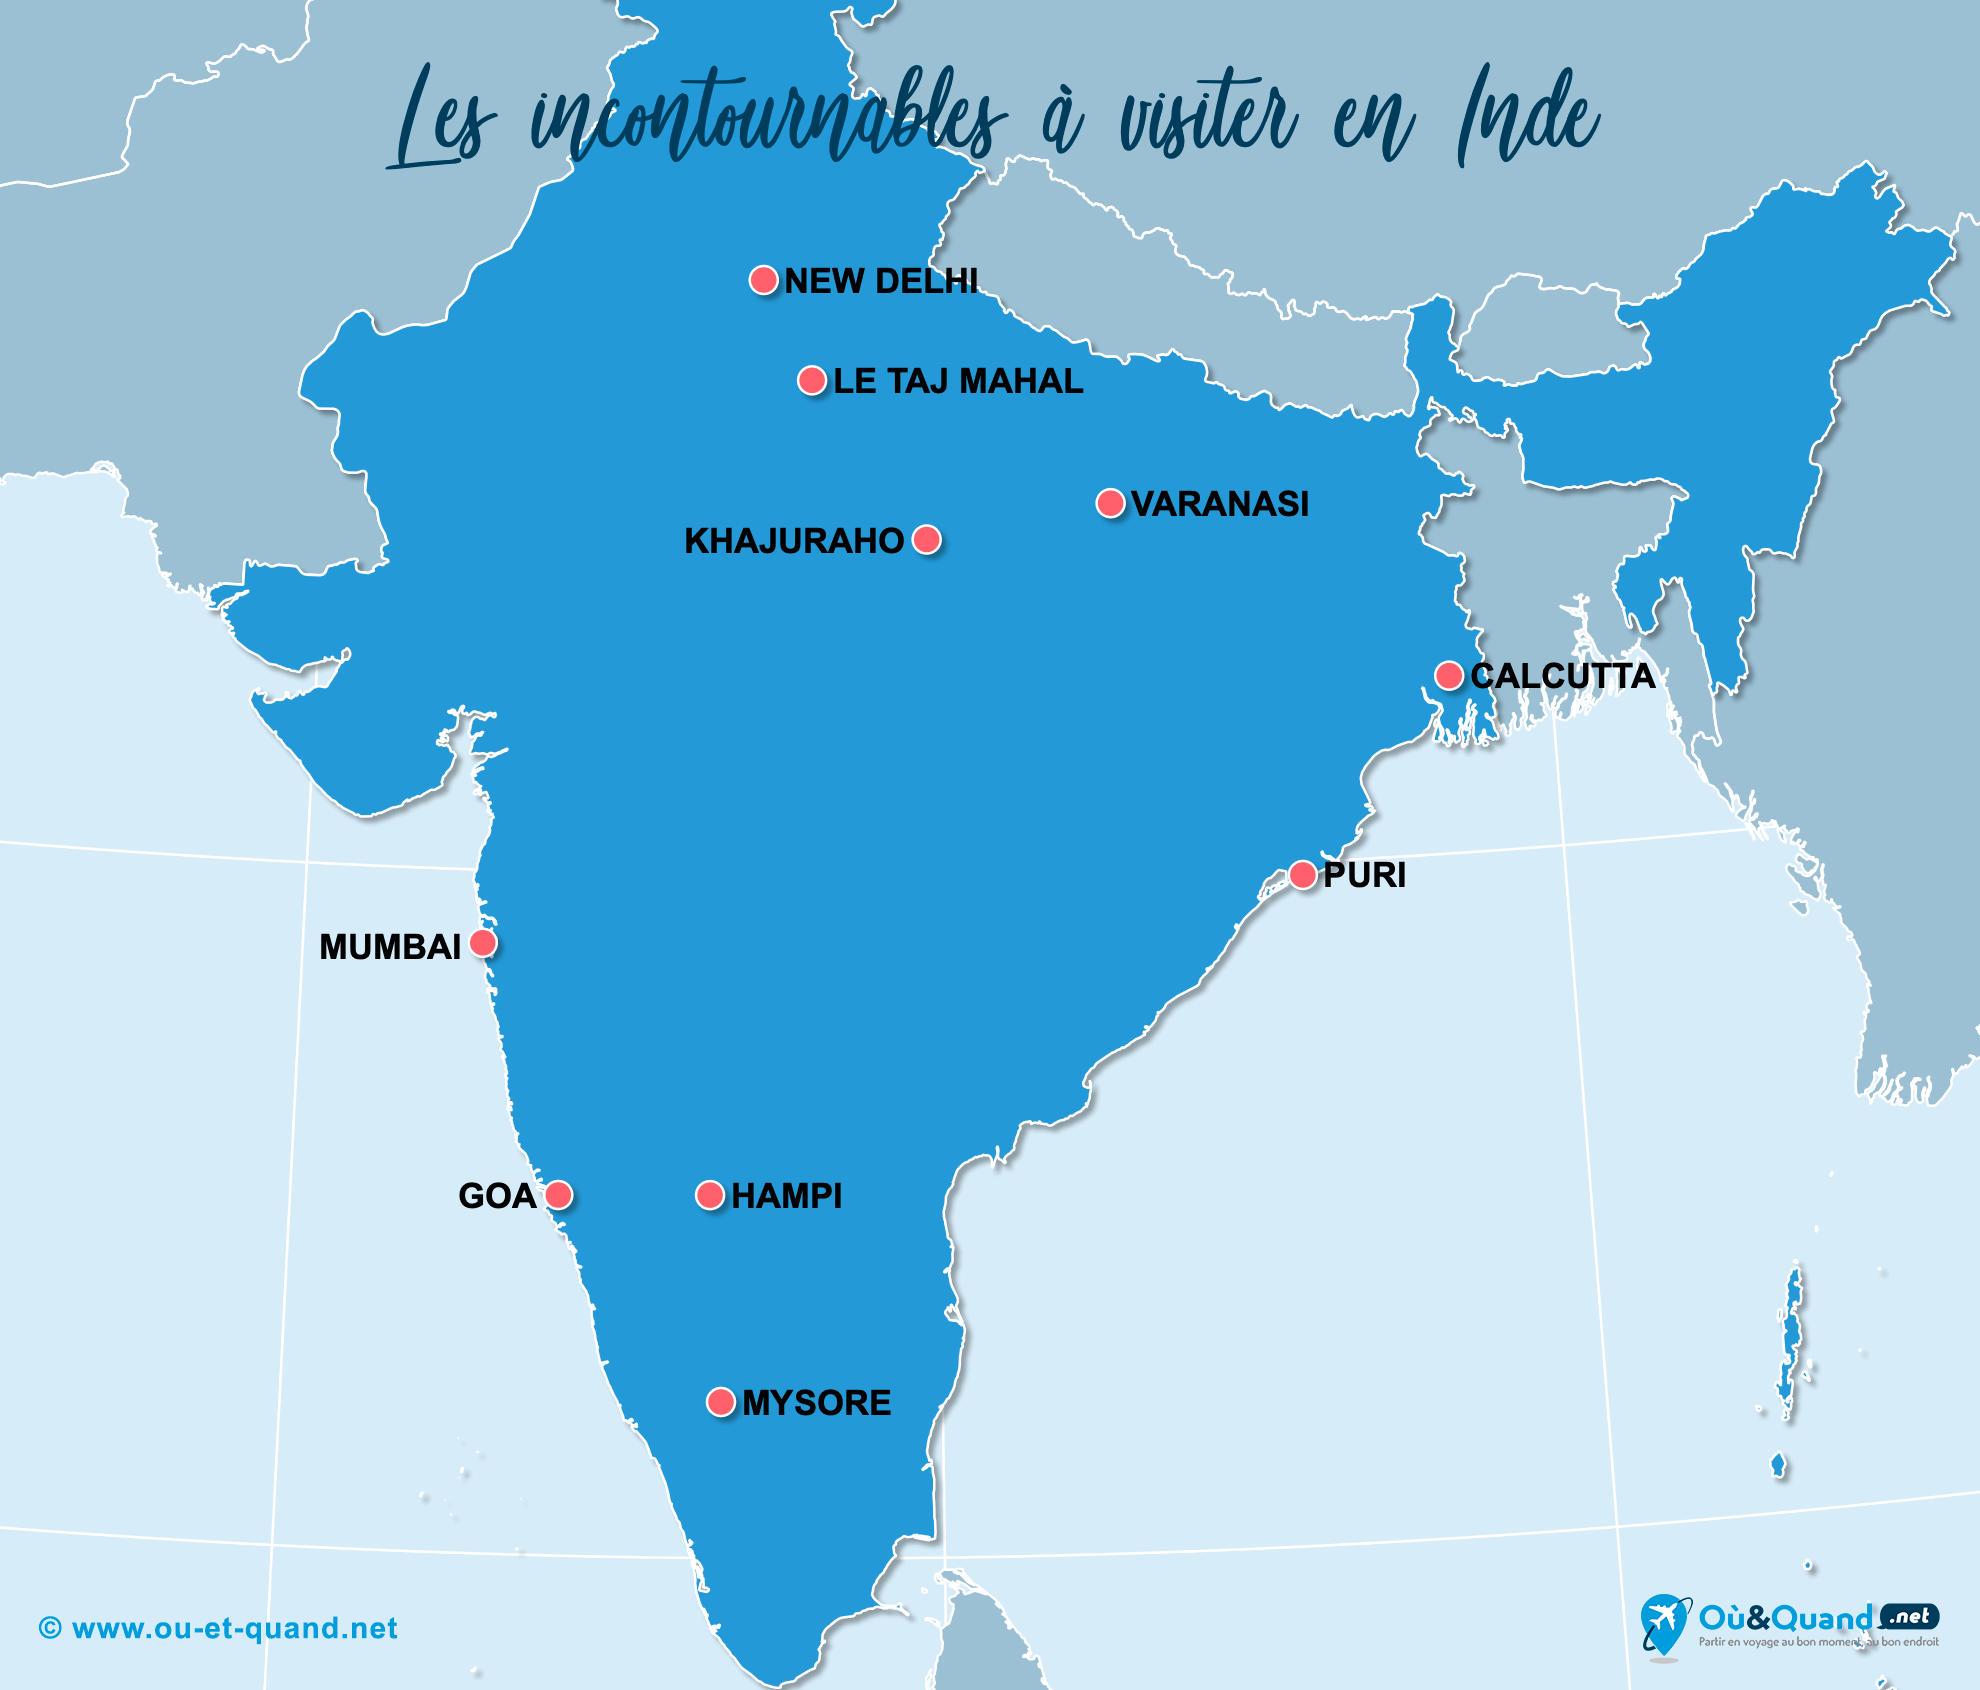 Carte Incontournables Inde